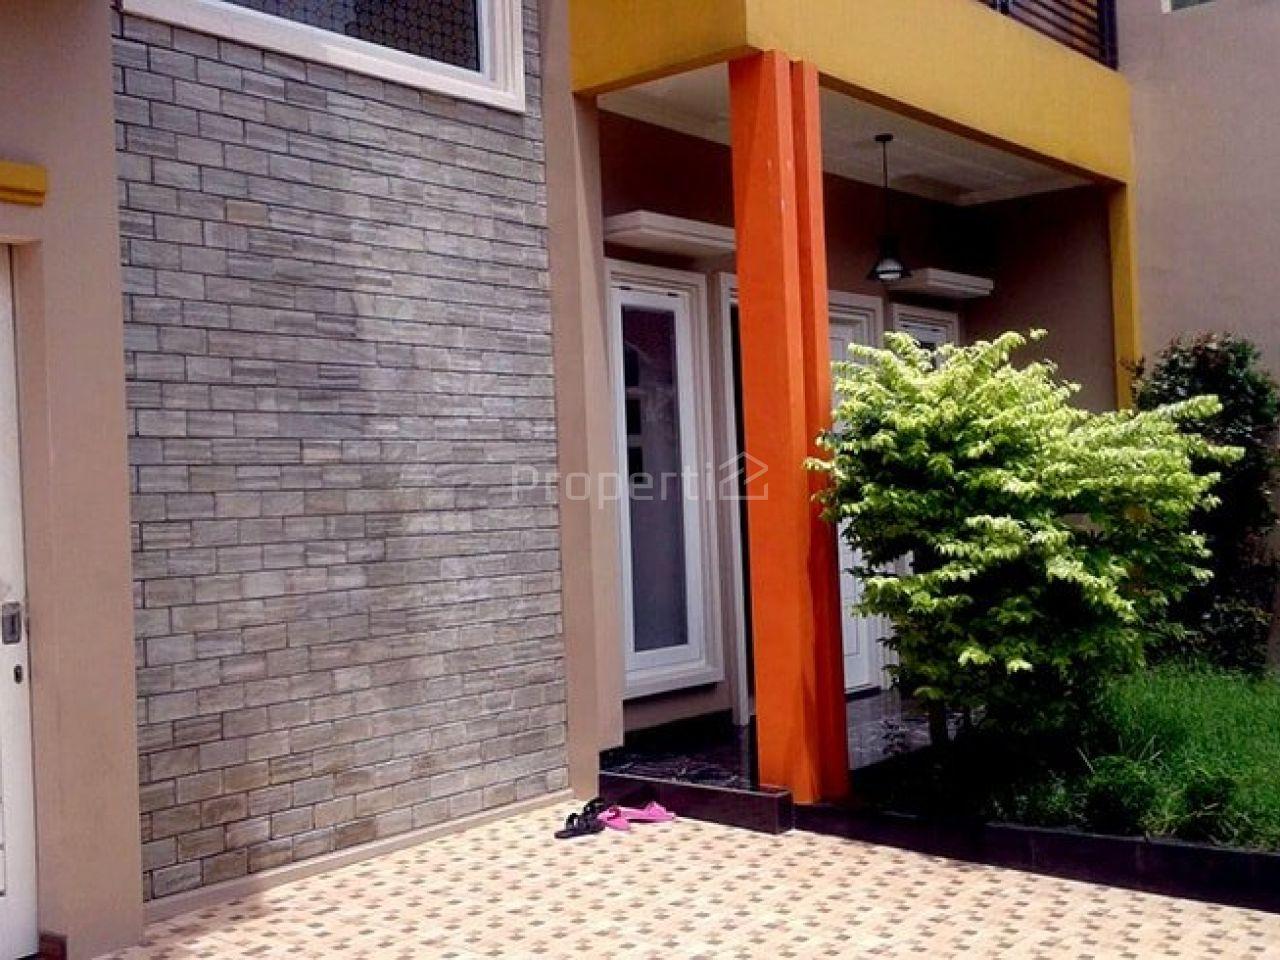 Rumah Baru Tipe Minimalis di Duren Sawit, DKI Jakarta